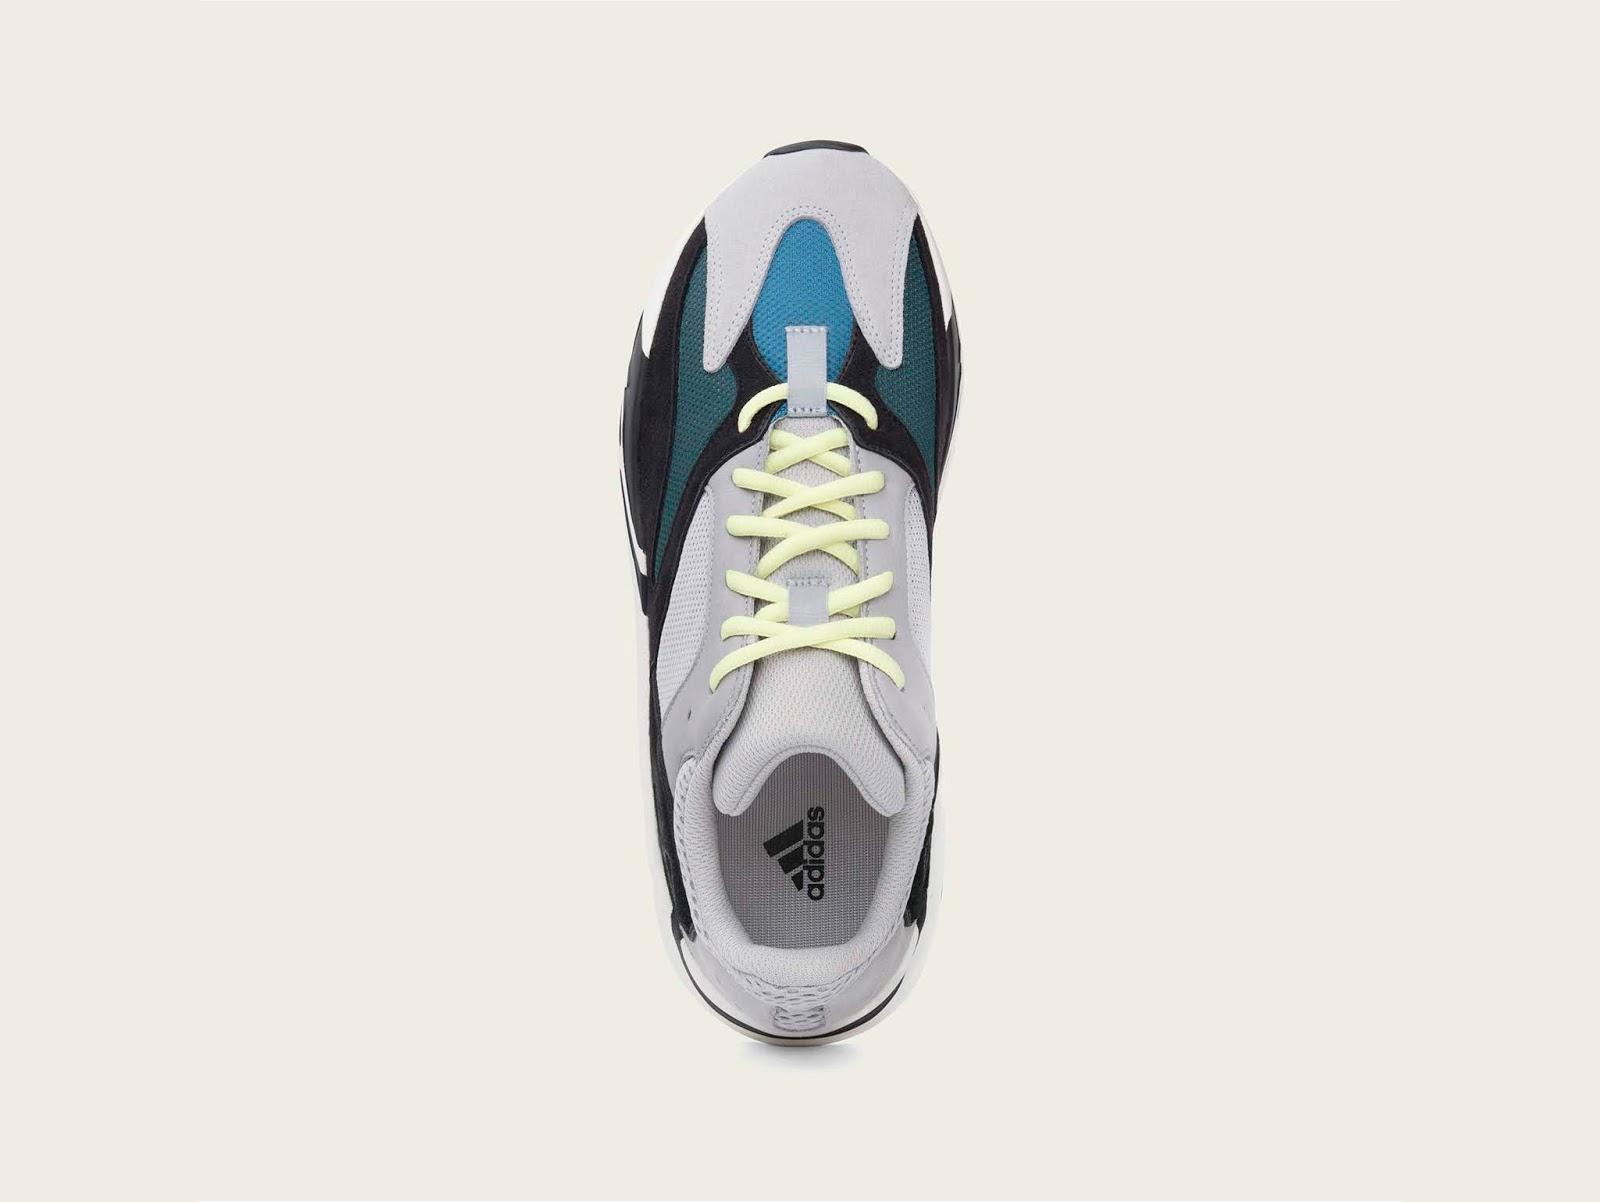 best service 72d52 3c697 Swag Craze: First Look: adidas Yeezy 700 'Wave Runner'